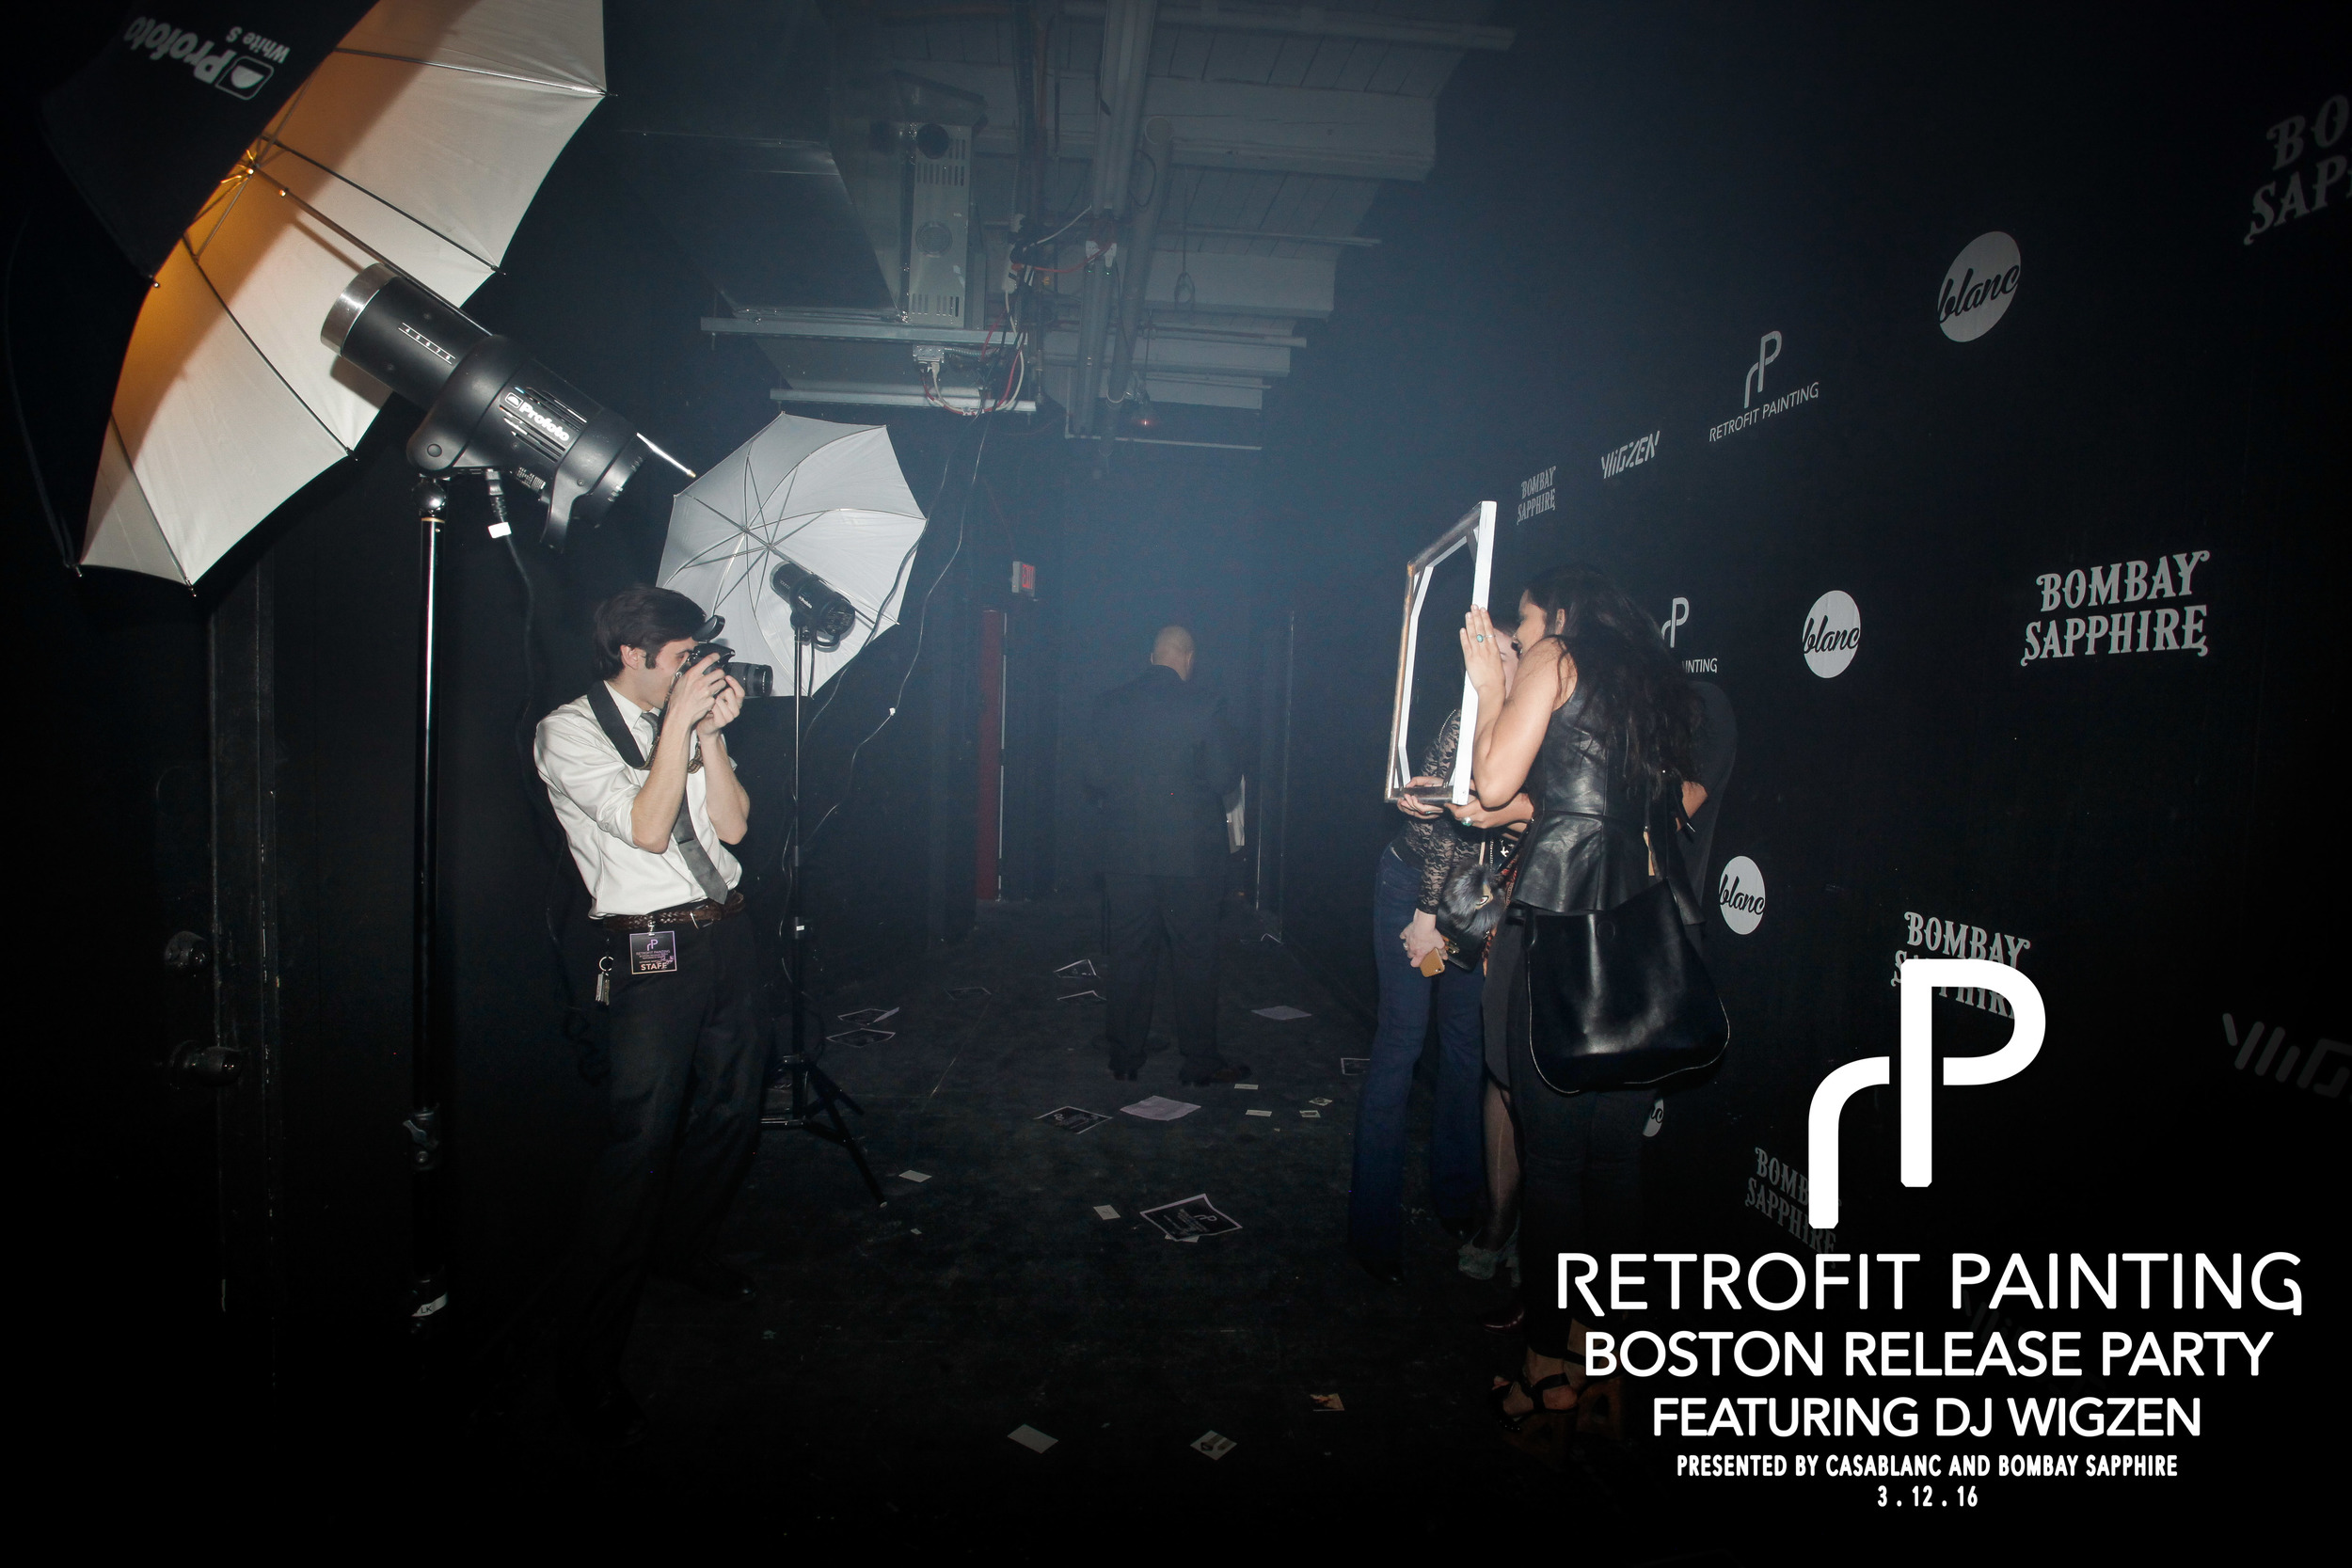 Retrofit Painting Boston Release Party 0096.jpg